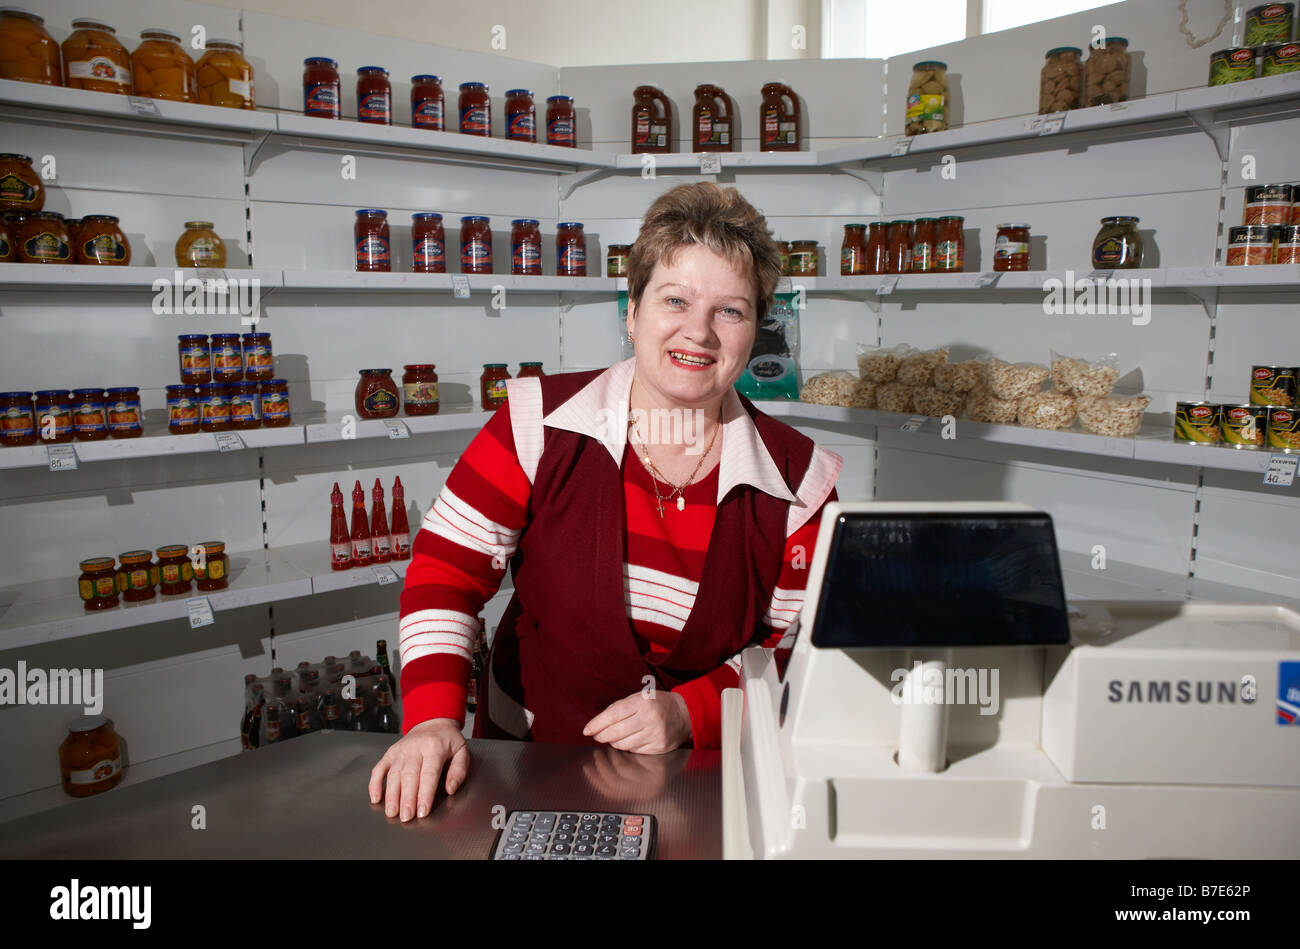 s clerk at store amguema chukotka siberia russia stock s clerk amguema chukotka siberia russia stock photo